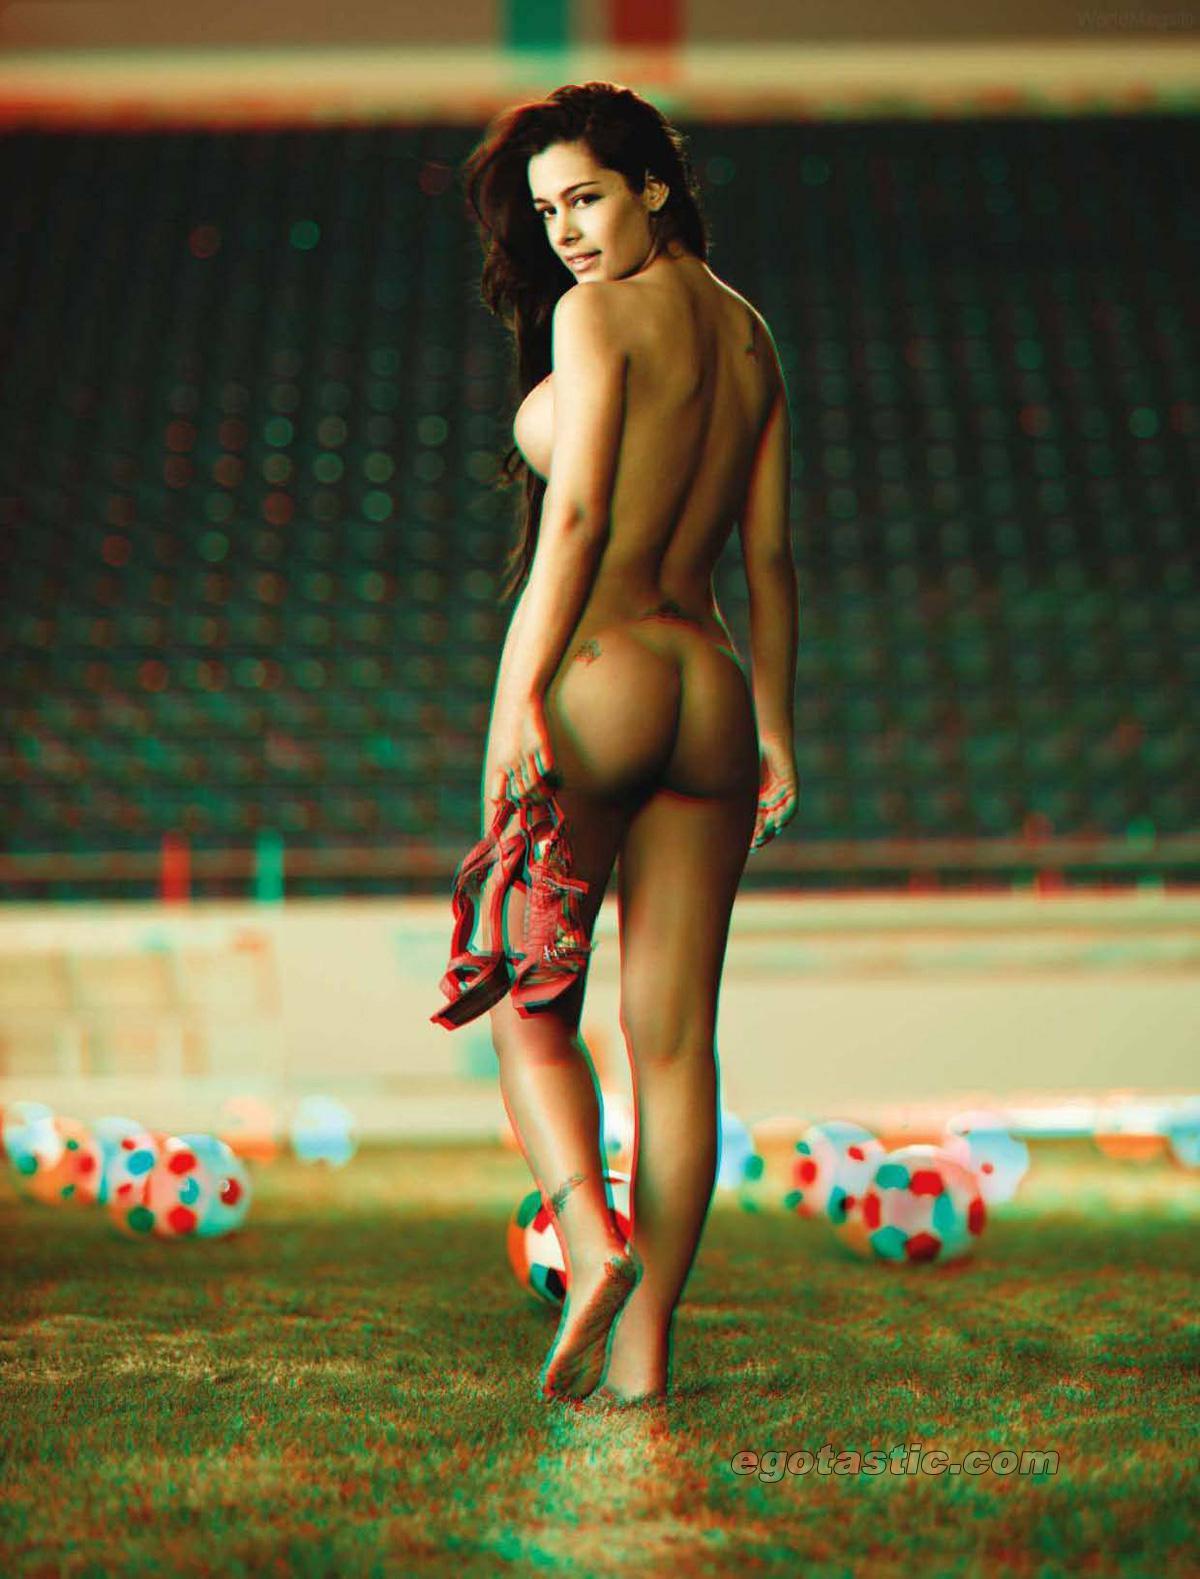 Playboy nude 3d photos sexy movies